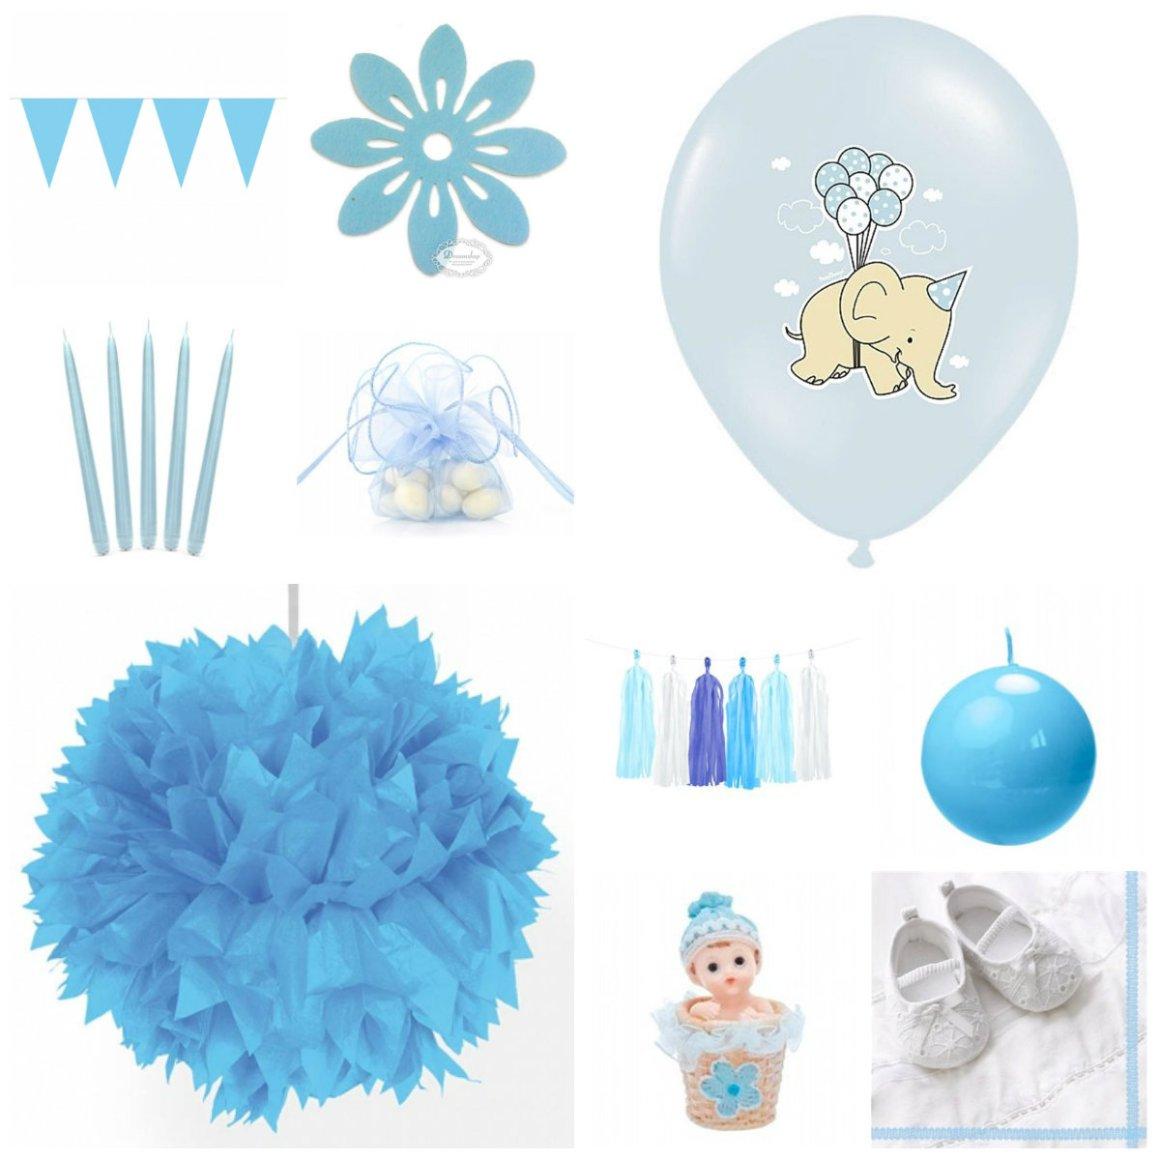 lyseblå barnedåb dreng bordpynt til barnedåb dekoration til barnedåb balloner til barnedåb balloner med elefanter guide til barnedåb lyseblå kuglelys dekoration til barnedåb